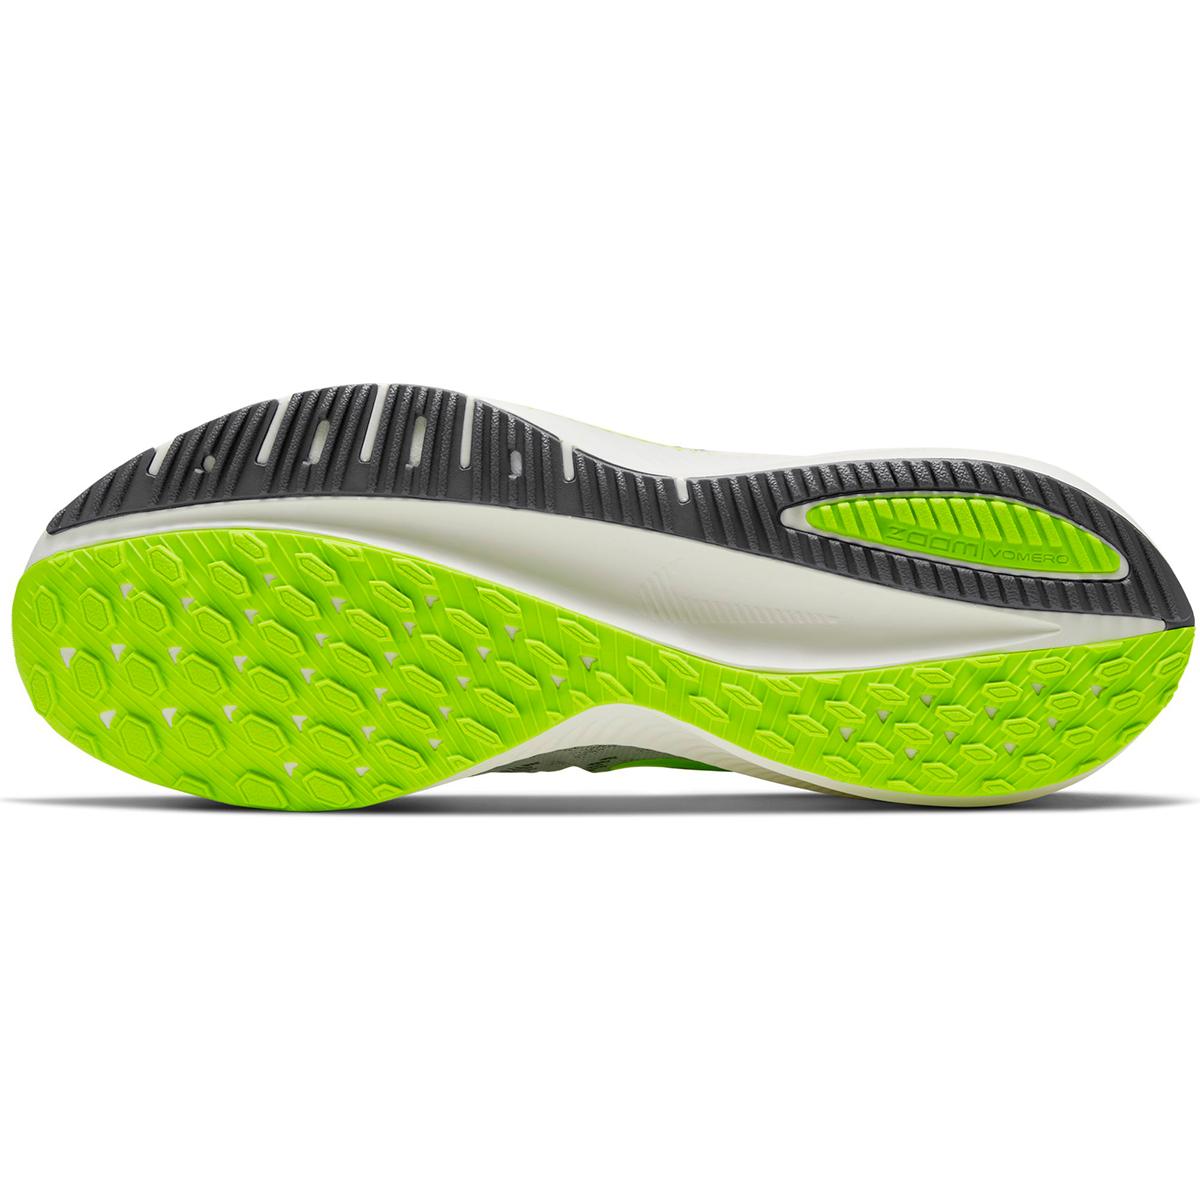 Men's Nike Air Zoom Vomero 14 Running Shoe - Color: Grey Fog/Smoke Grey/Volt/Sail (Regular Width) - Size: 6, Grey Fog/Smoke Grey/Volt/Sail, large, image 4